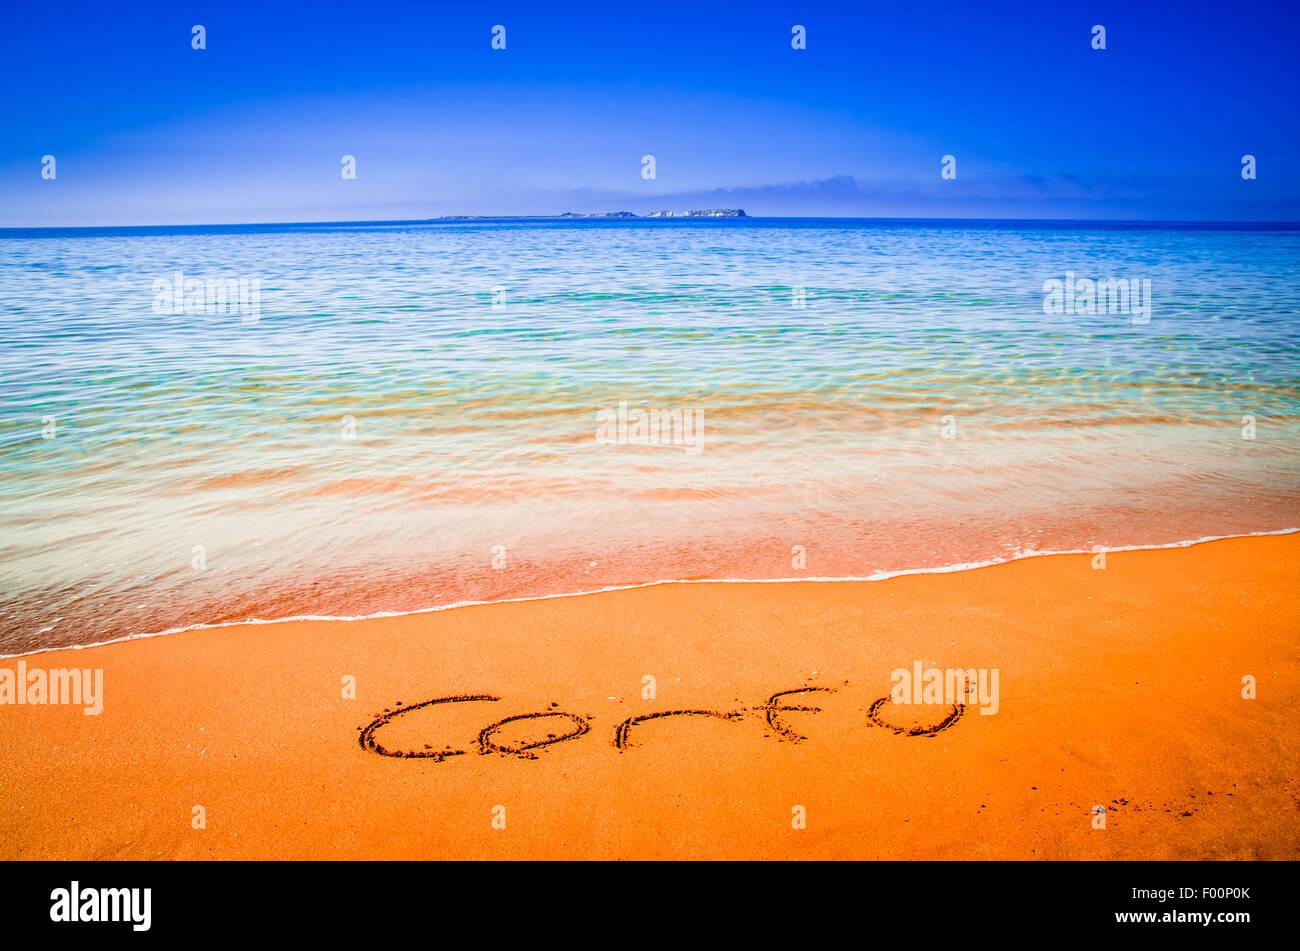 Corfu word written on a sandy golden beach, Greece. Selective focus. - Stock Image